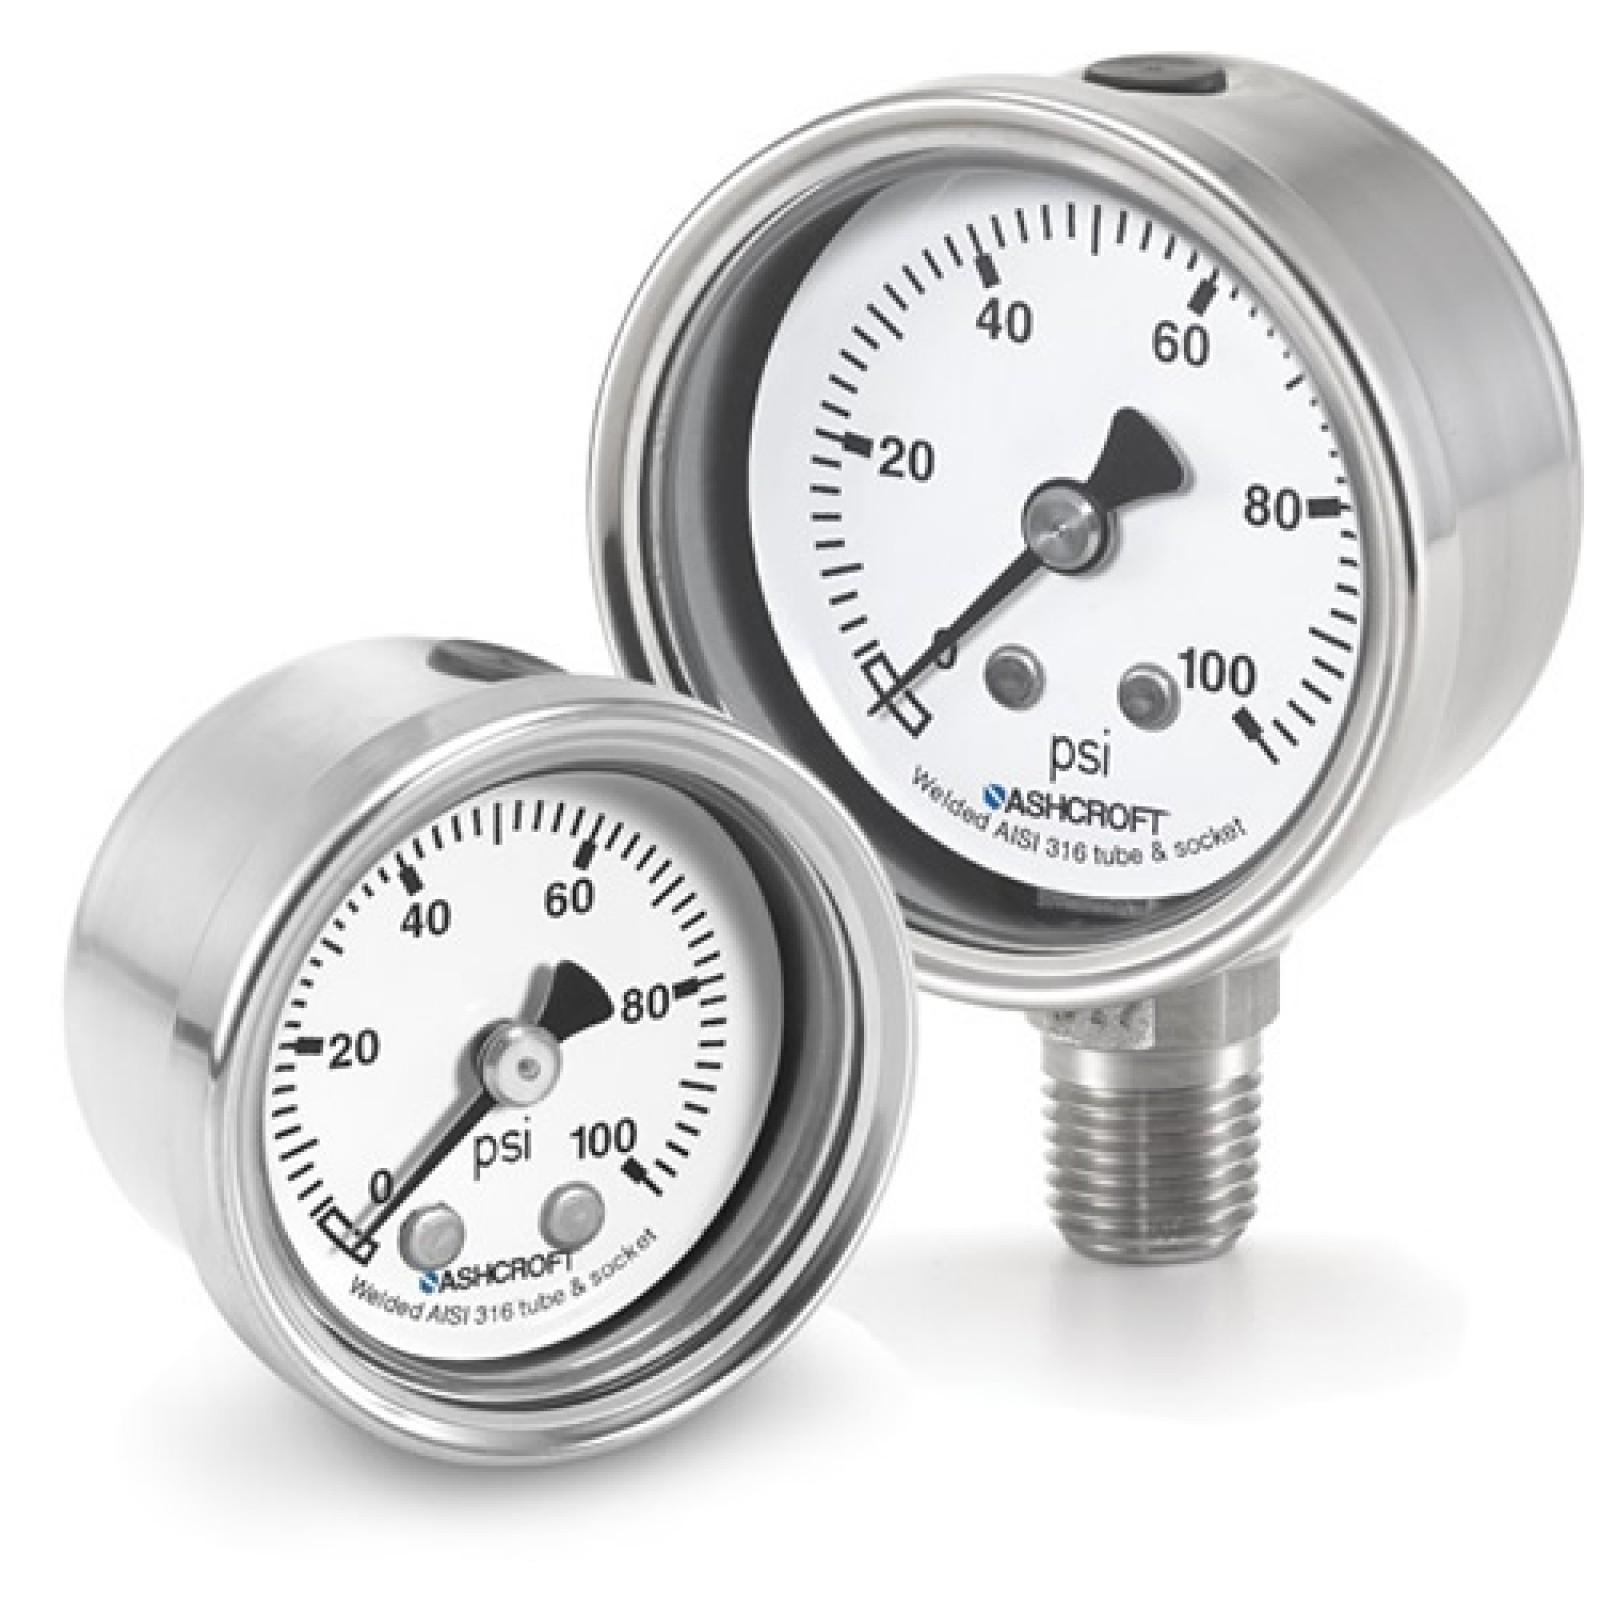 "63 1008S 02L XLL 1000#/KP - Pressure Gauge, 63mm stainless 1/4"" NPT Lower conn & Case, Plus Performance 0/1000 psi"